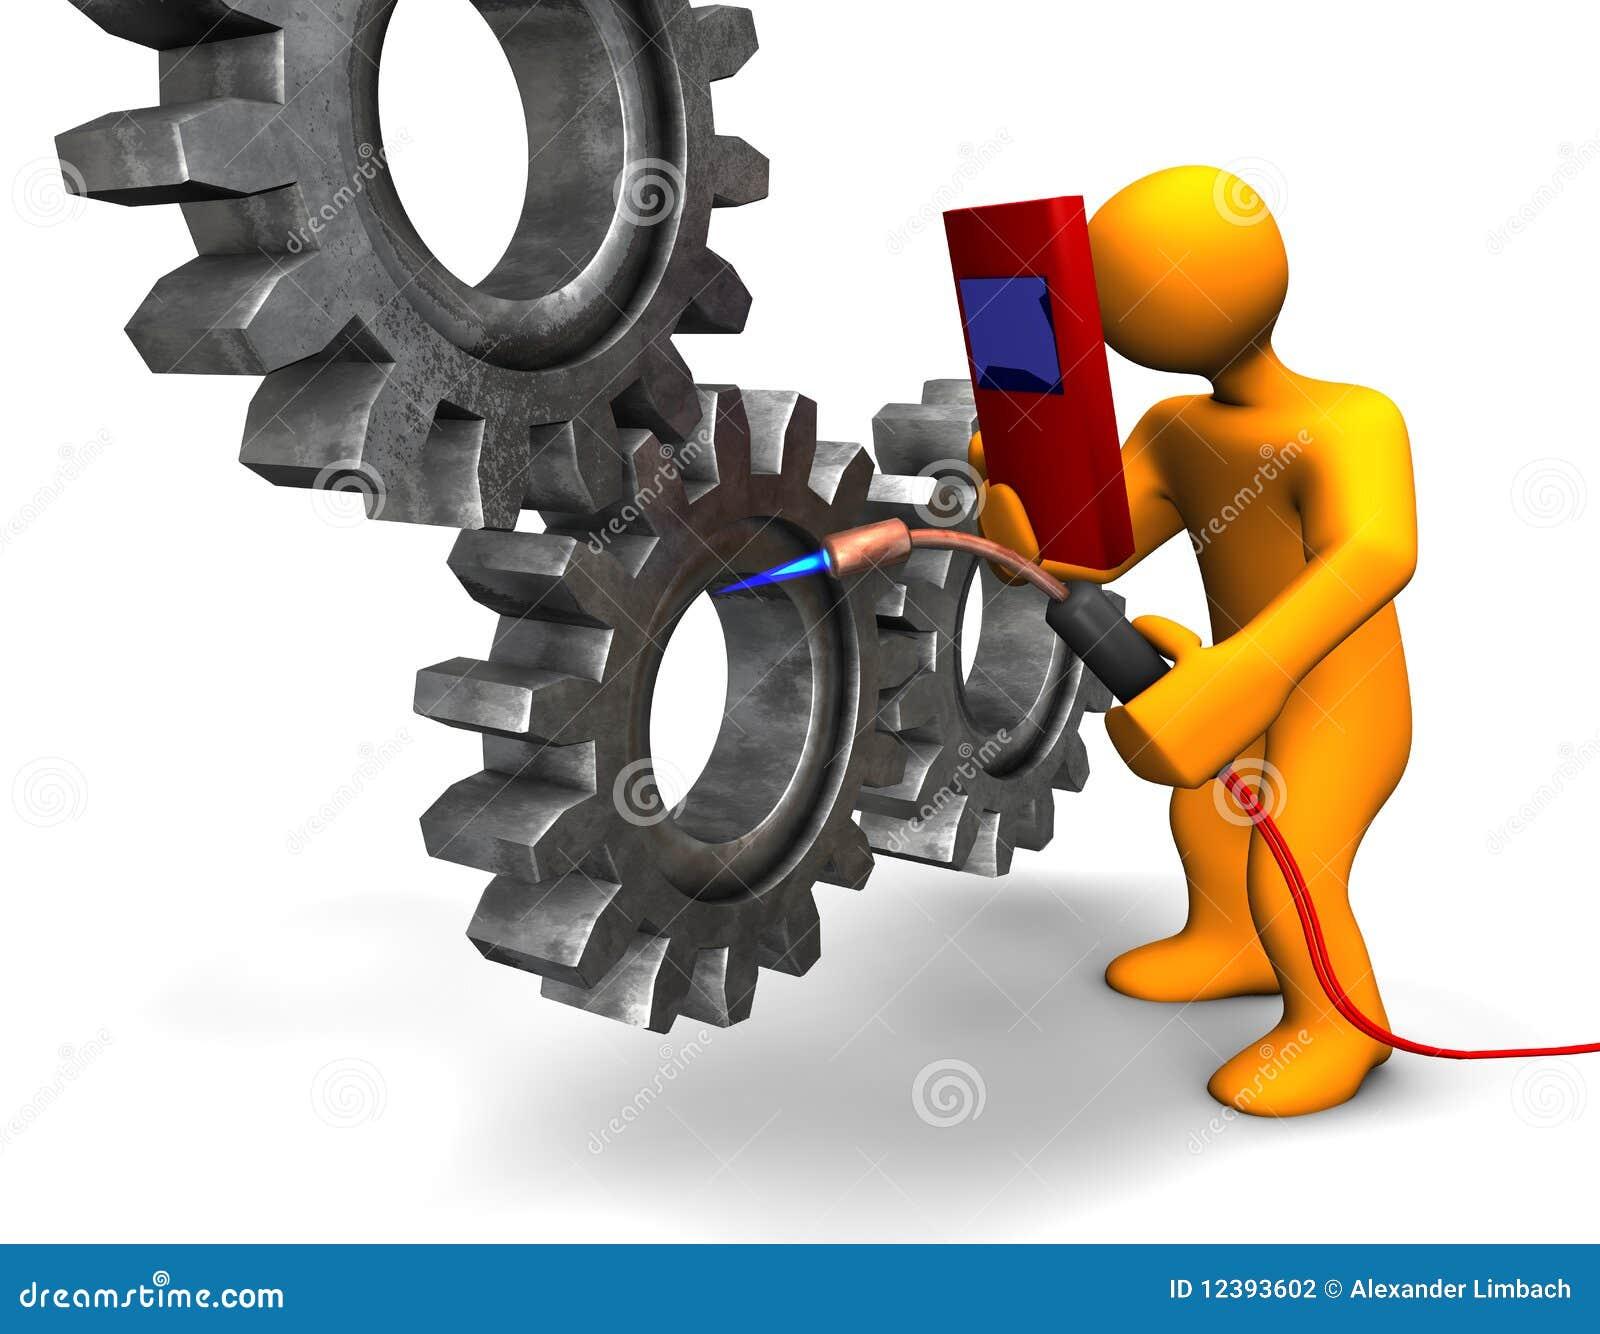 Solder Stock Illustrations 402 Vectors Kaos Welder Welding 3dimensi 3d Illustration Looks A Humanoid Person At Vector